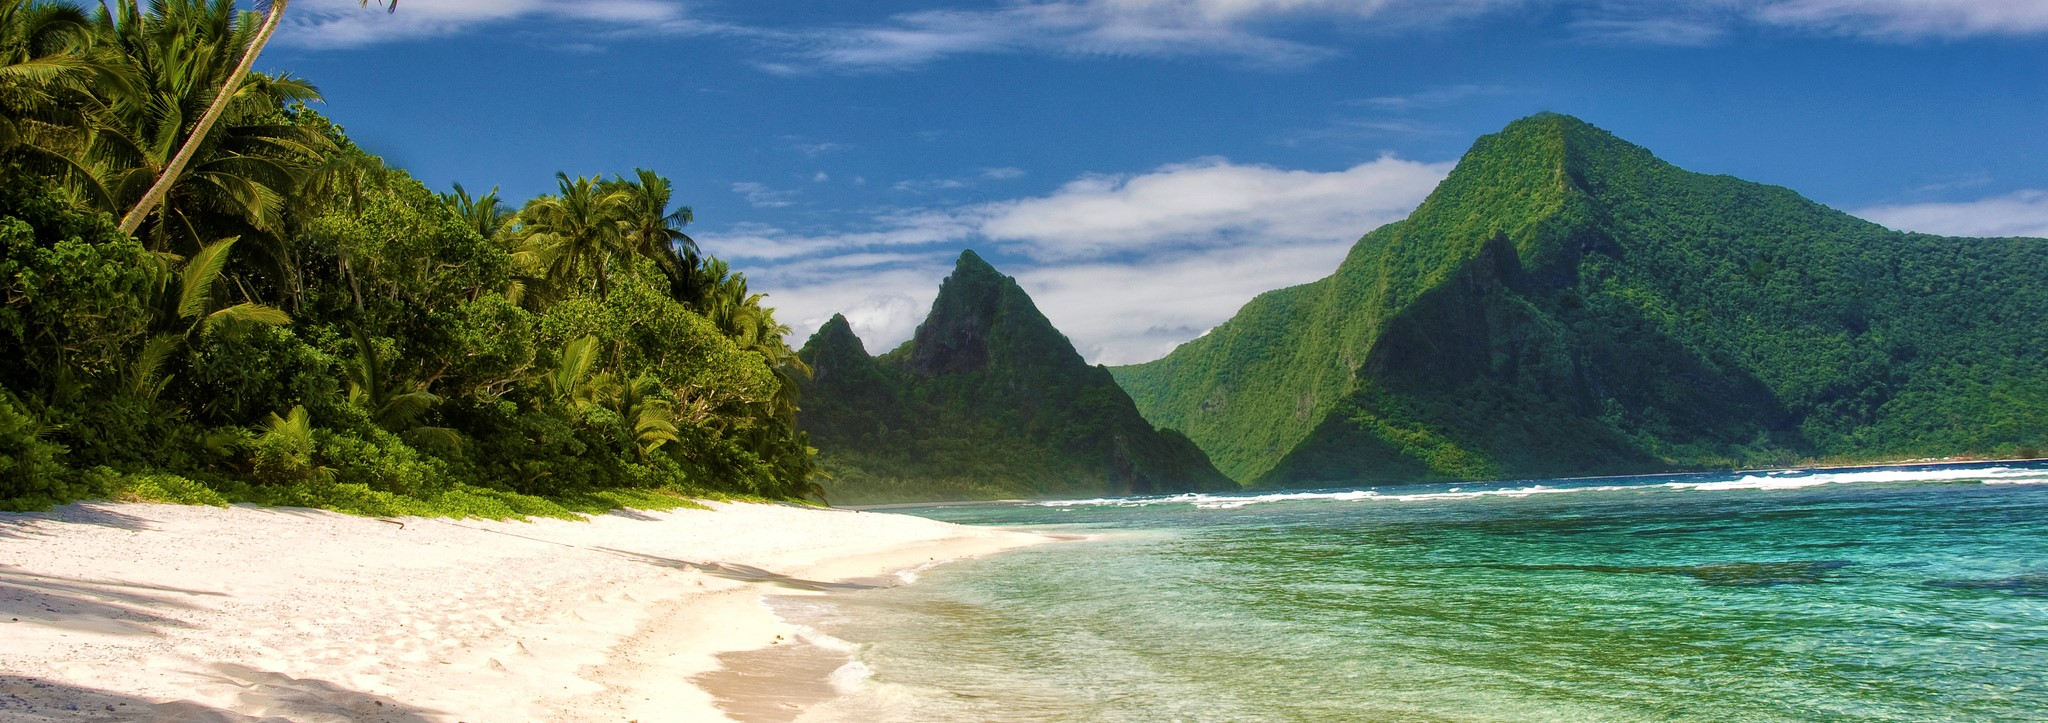 Ta' u Island, American Samoa (Photo: US Dept of the Interior)